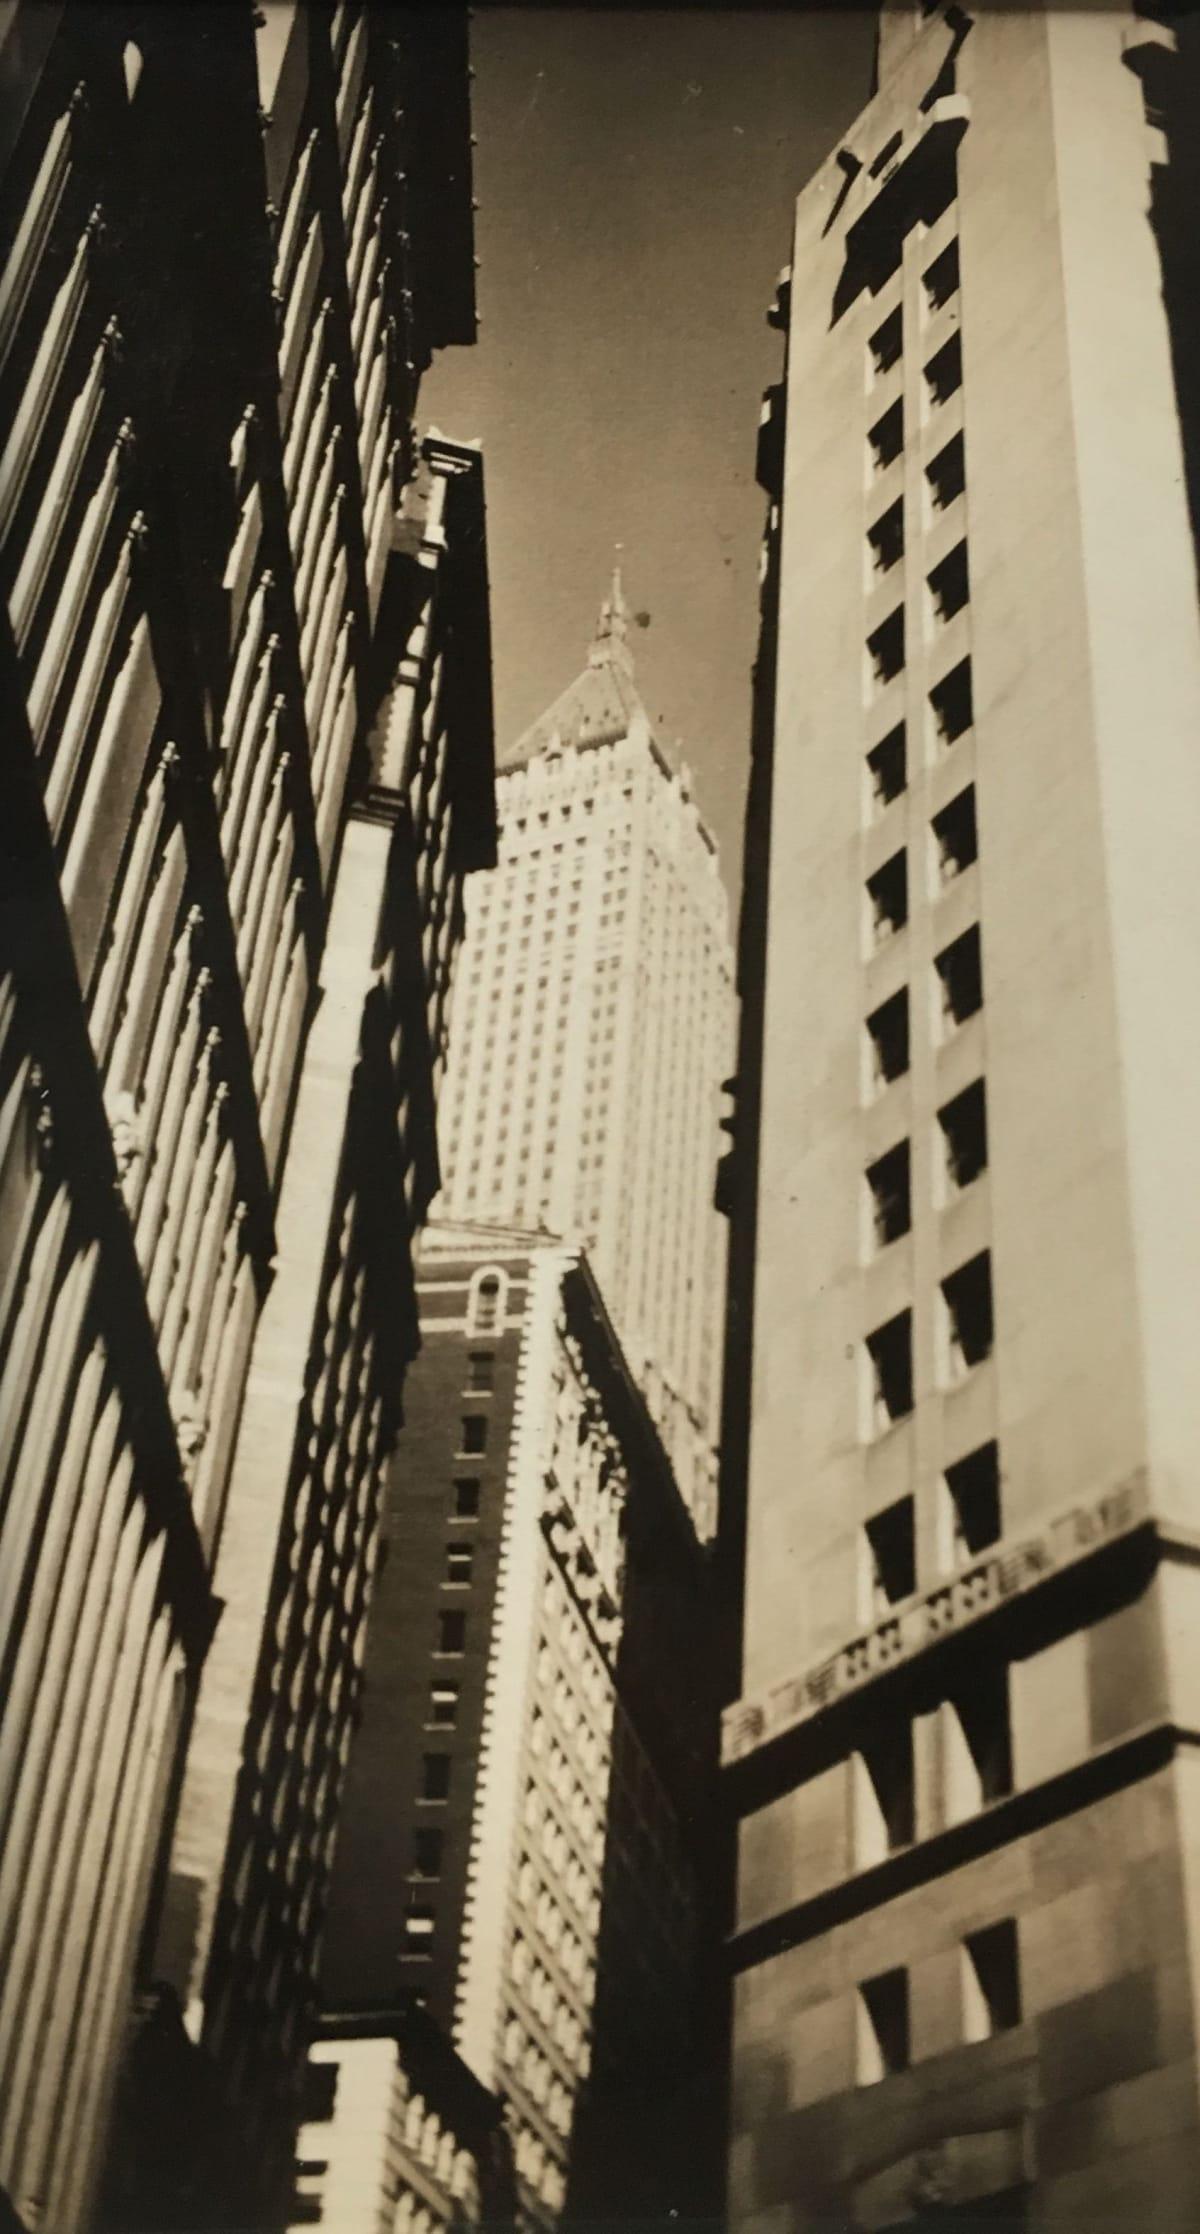 Fred Zinnemann Buildings, New York, 1932 Vintage gelatin silver print 4 1/4 x 2 7/16 inches